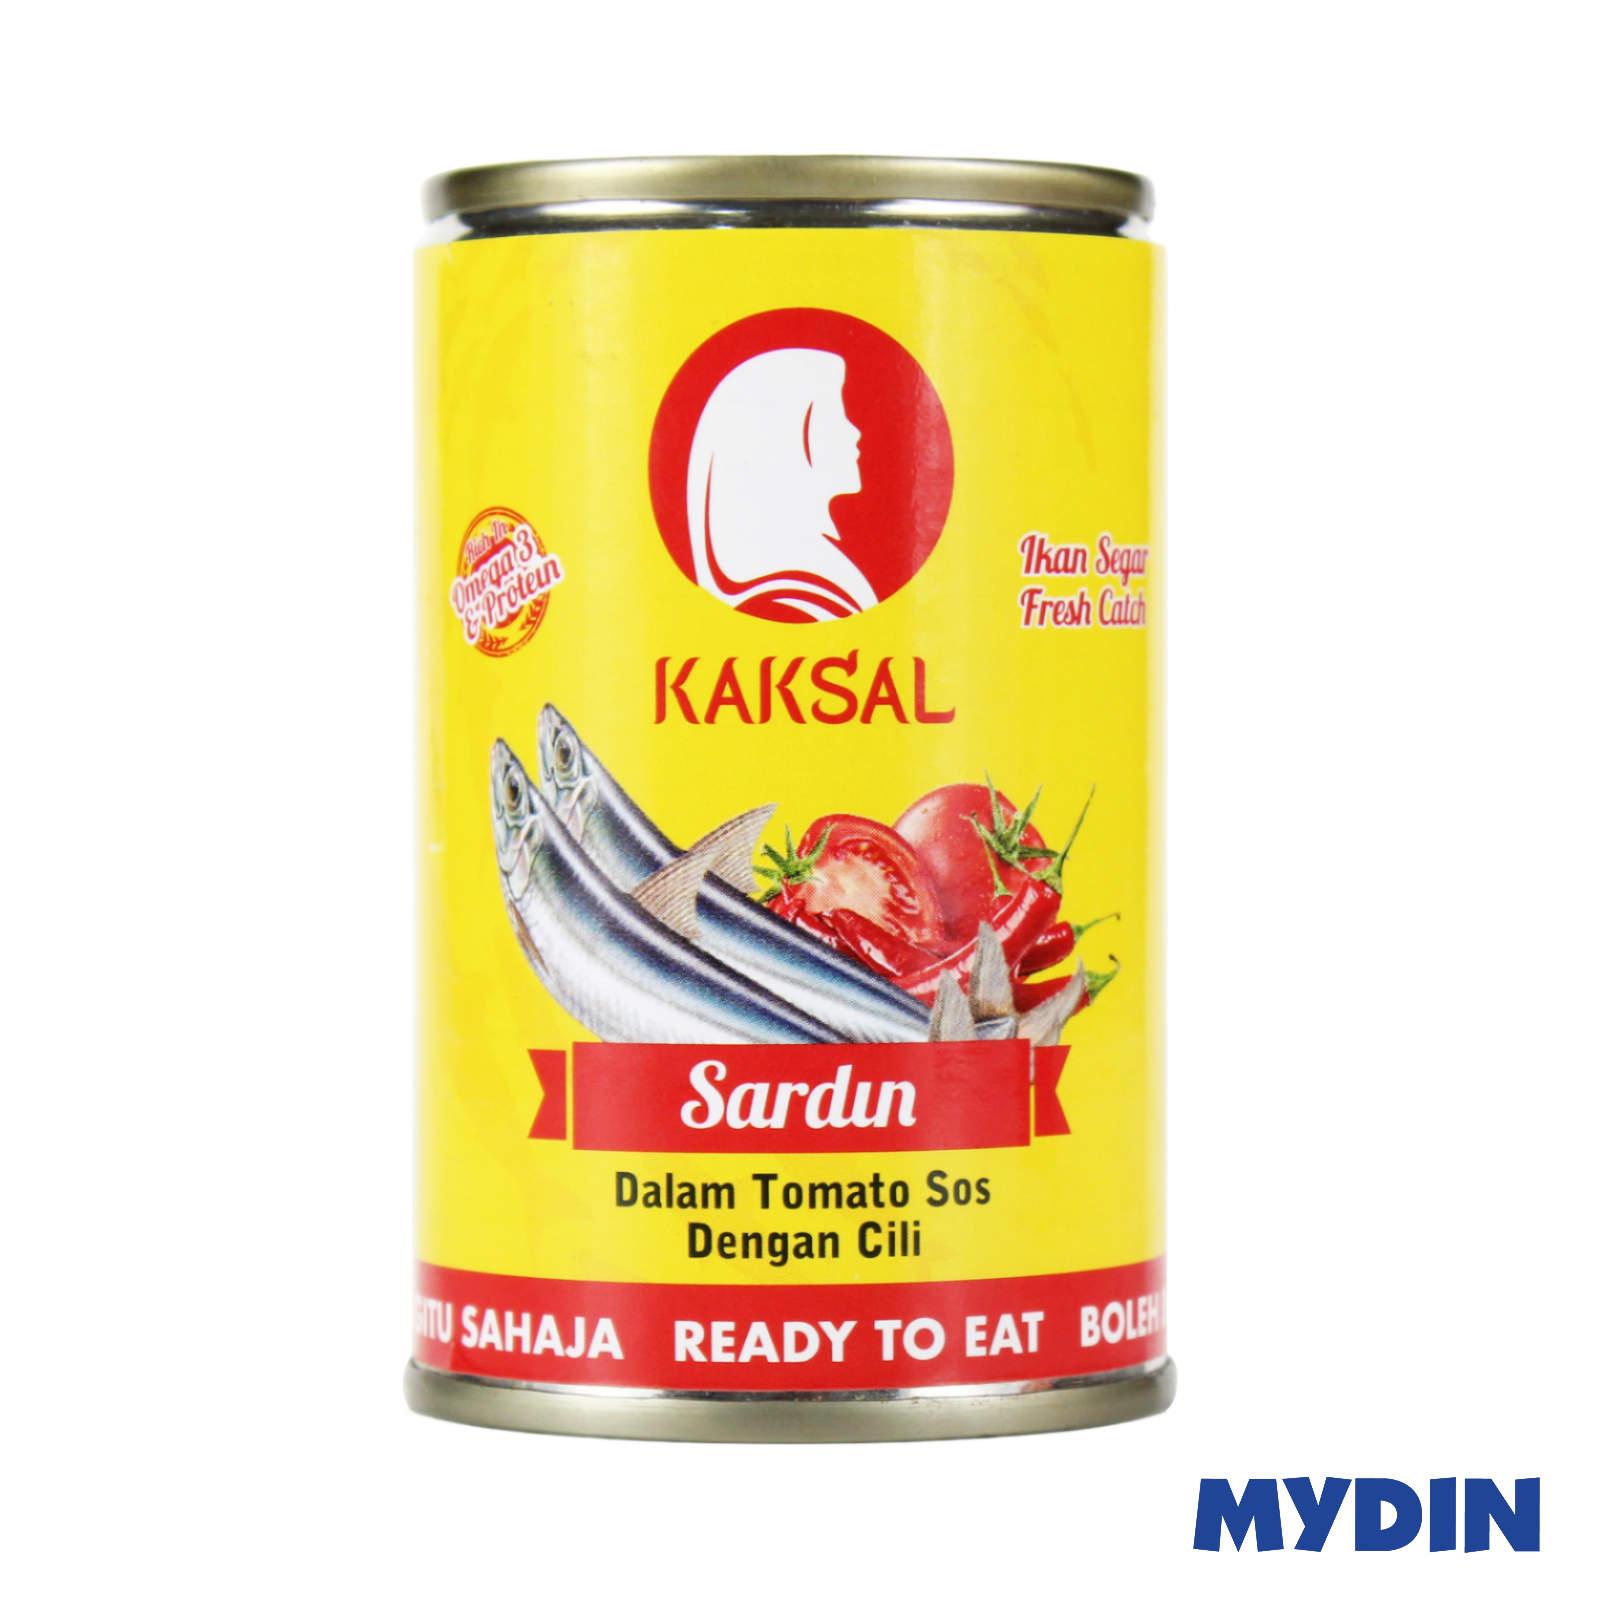 Kak Sal Sardine In Tomato Sauce With Chilli (155g)